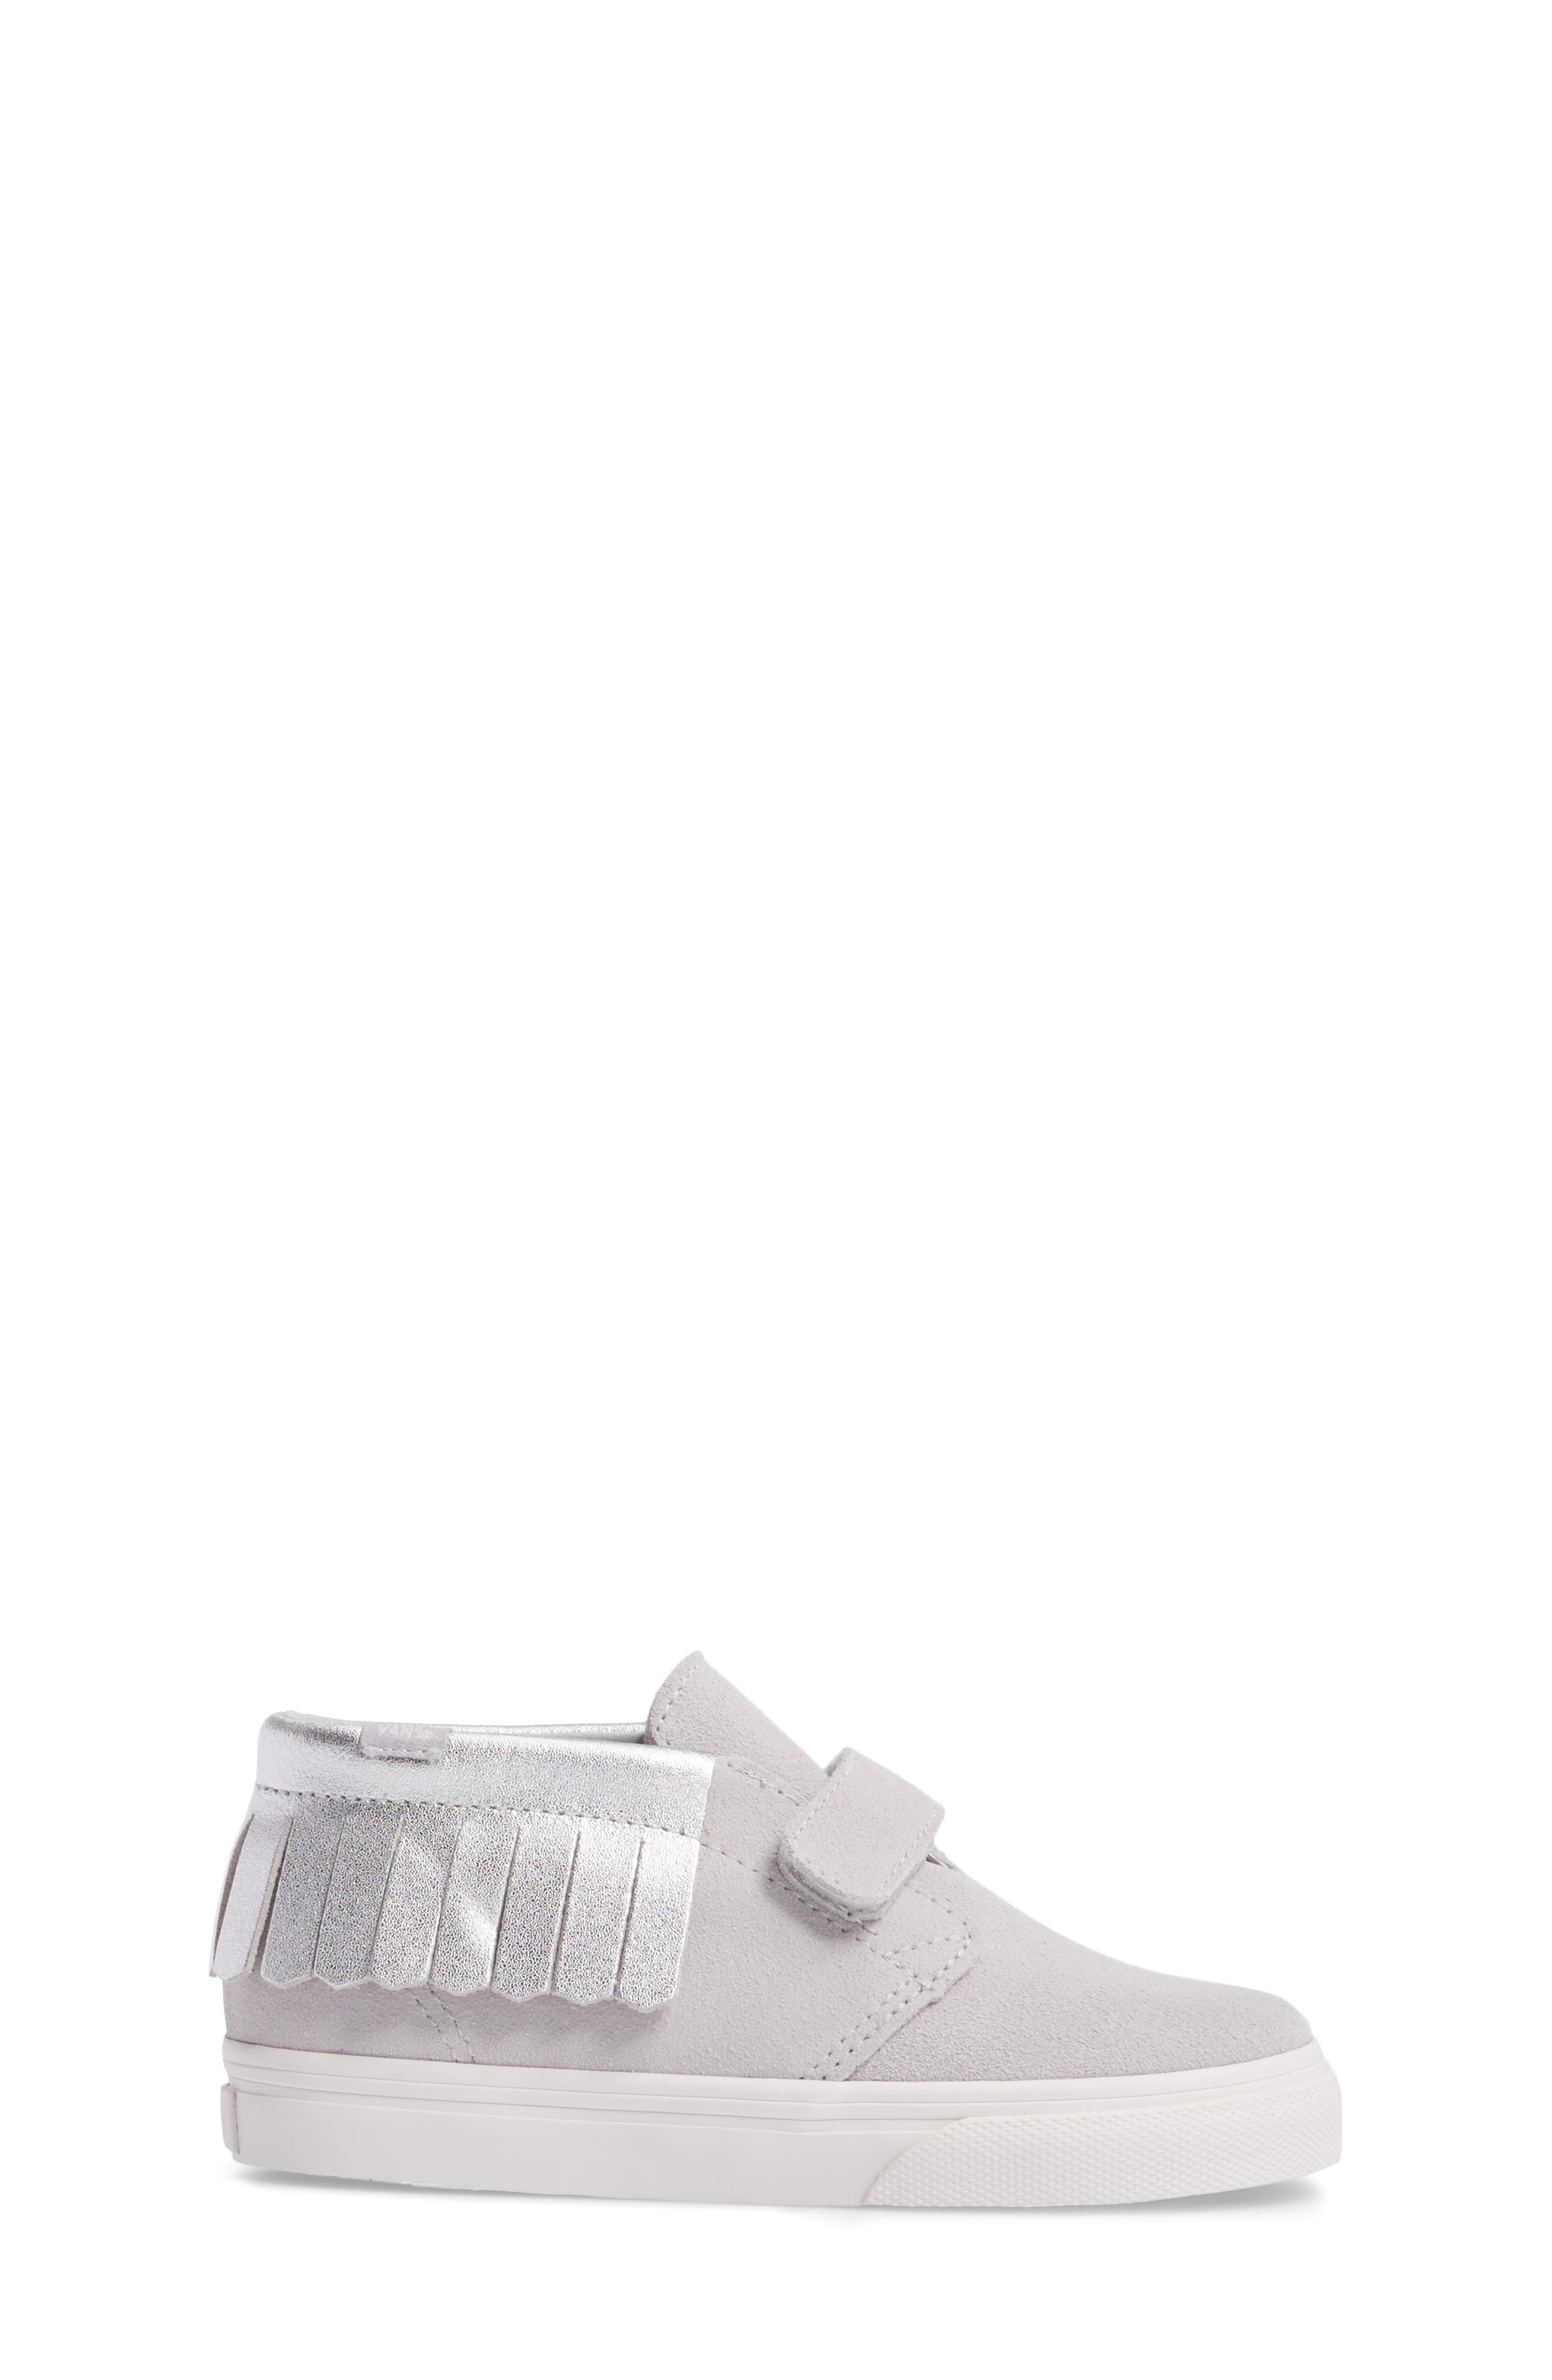 Chukka V Moc Sneaker,                             Alternate thumbnail 3, color,                             040